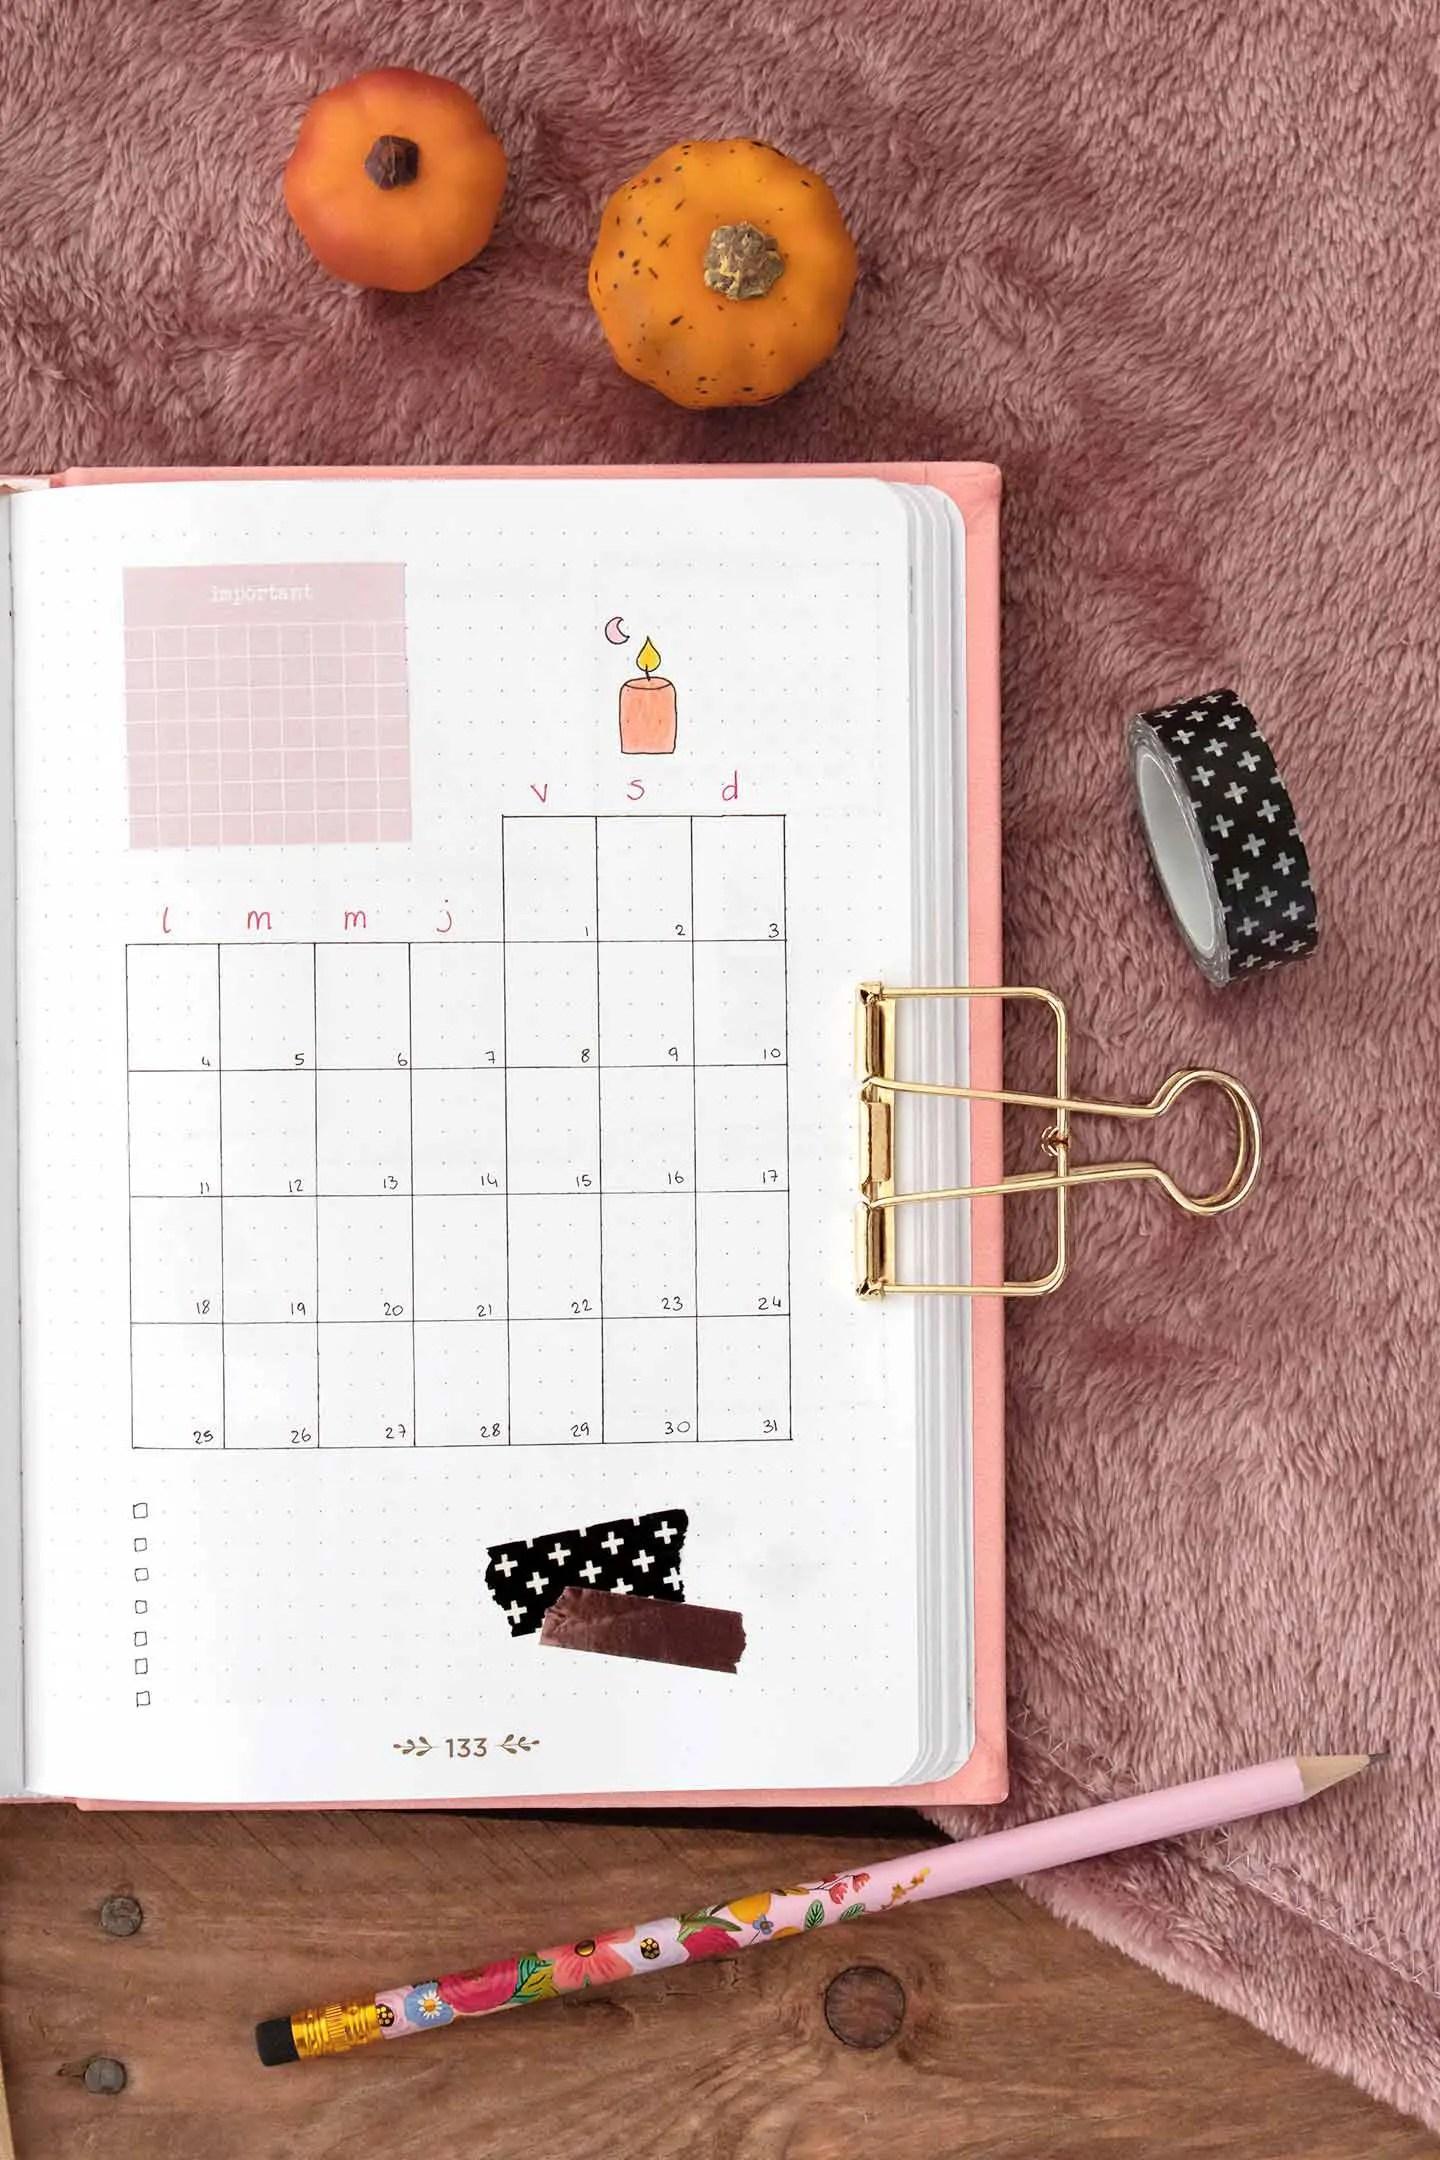 Monthly log octobre